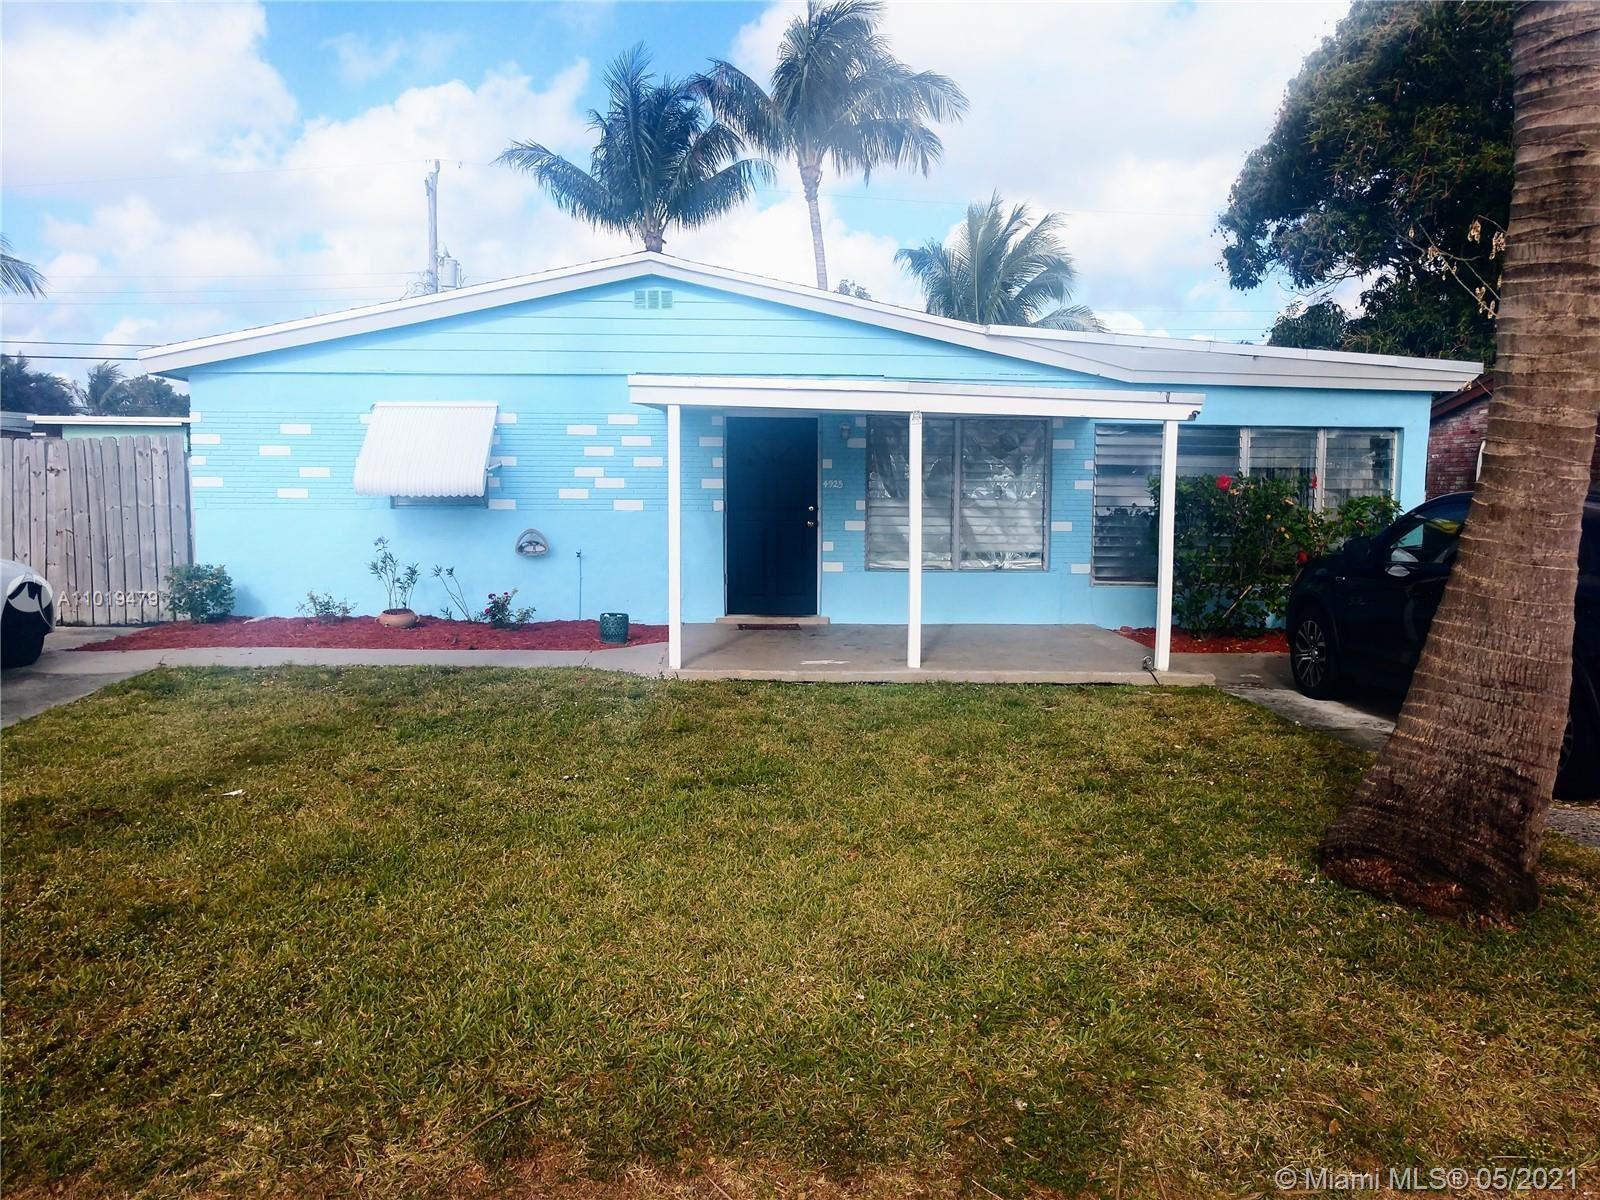 Photo of 4925 SW 44th Ave, Dania Beach, FL 33314 (MLS # A11019479)